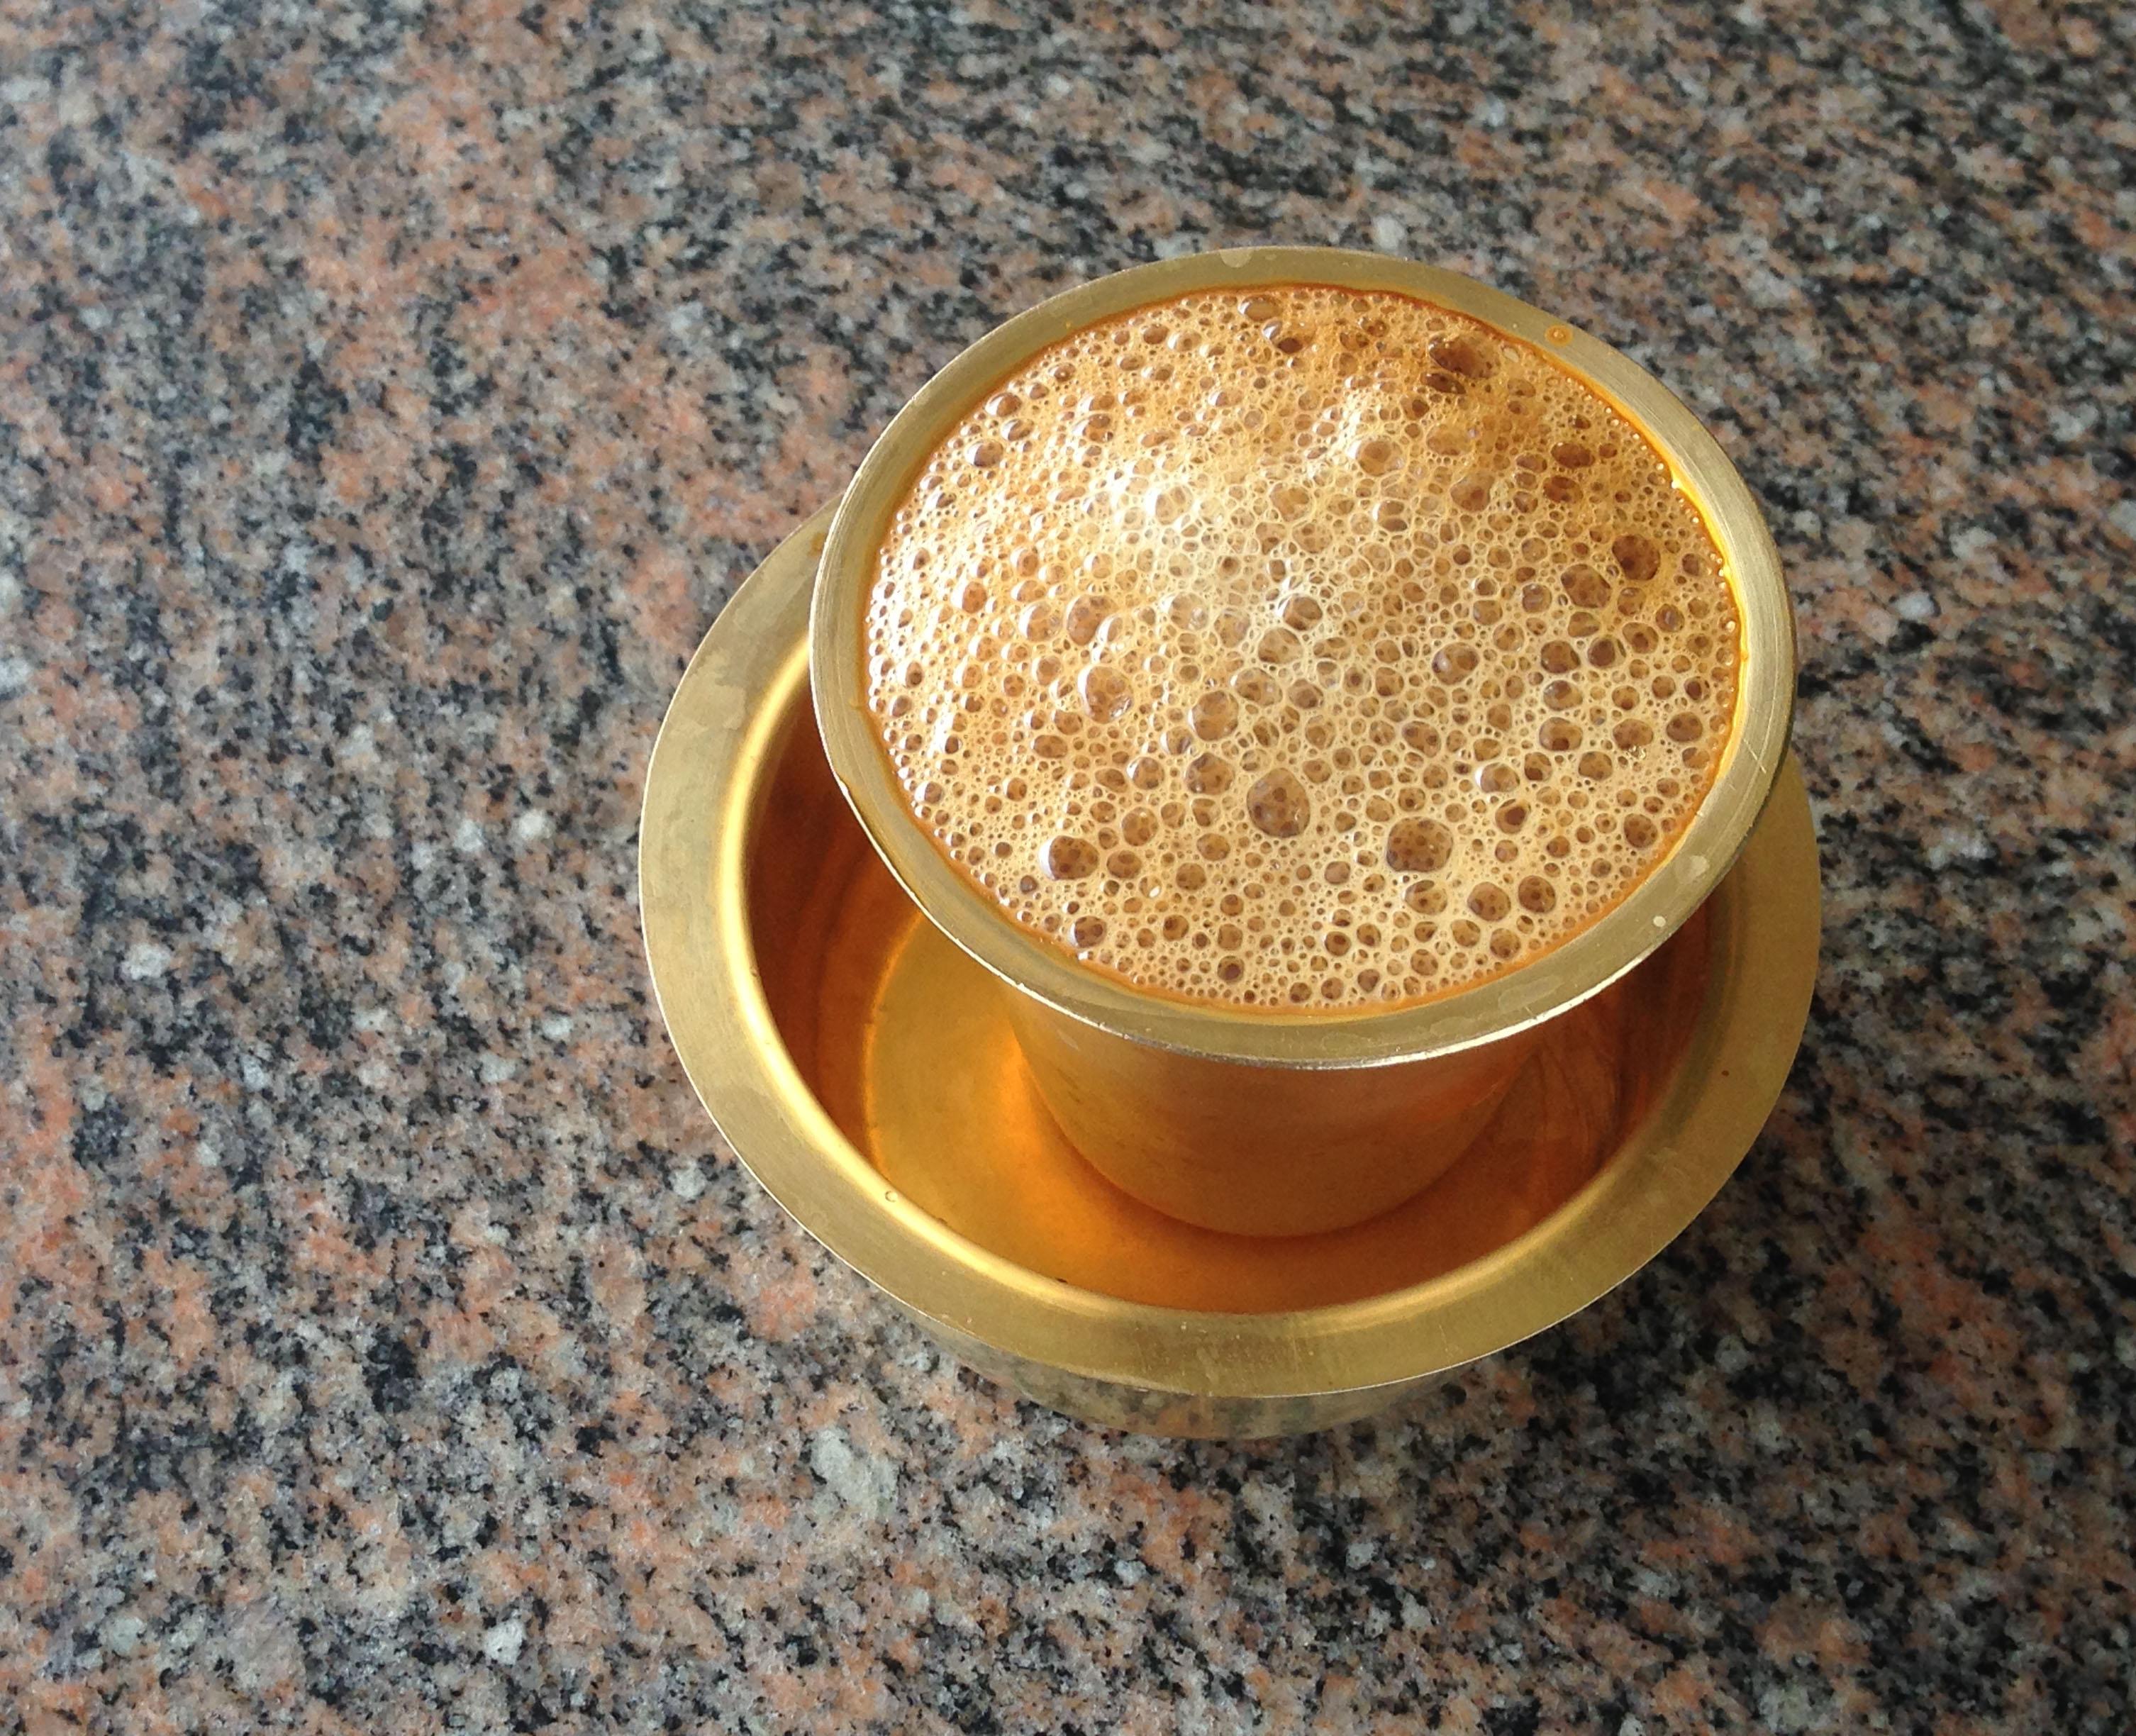 File:Filter-Coffee.jpg - Wikimedia Commons